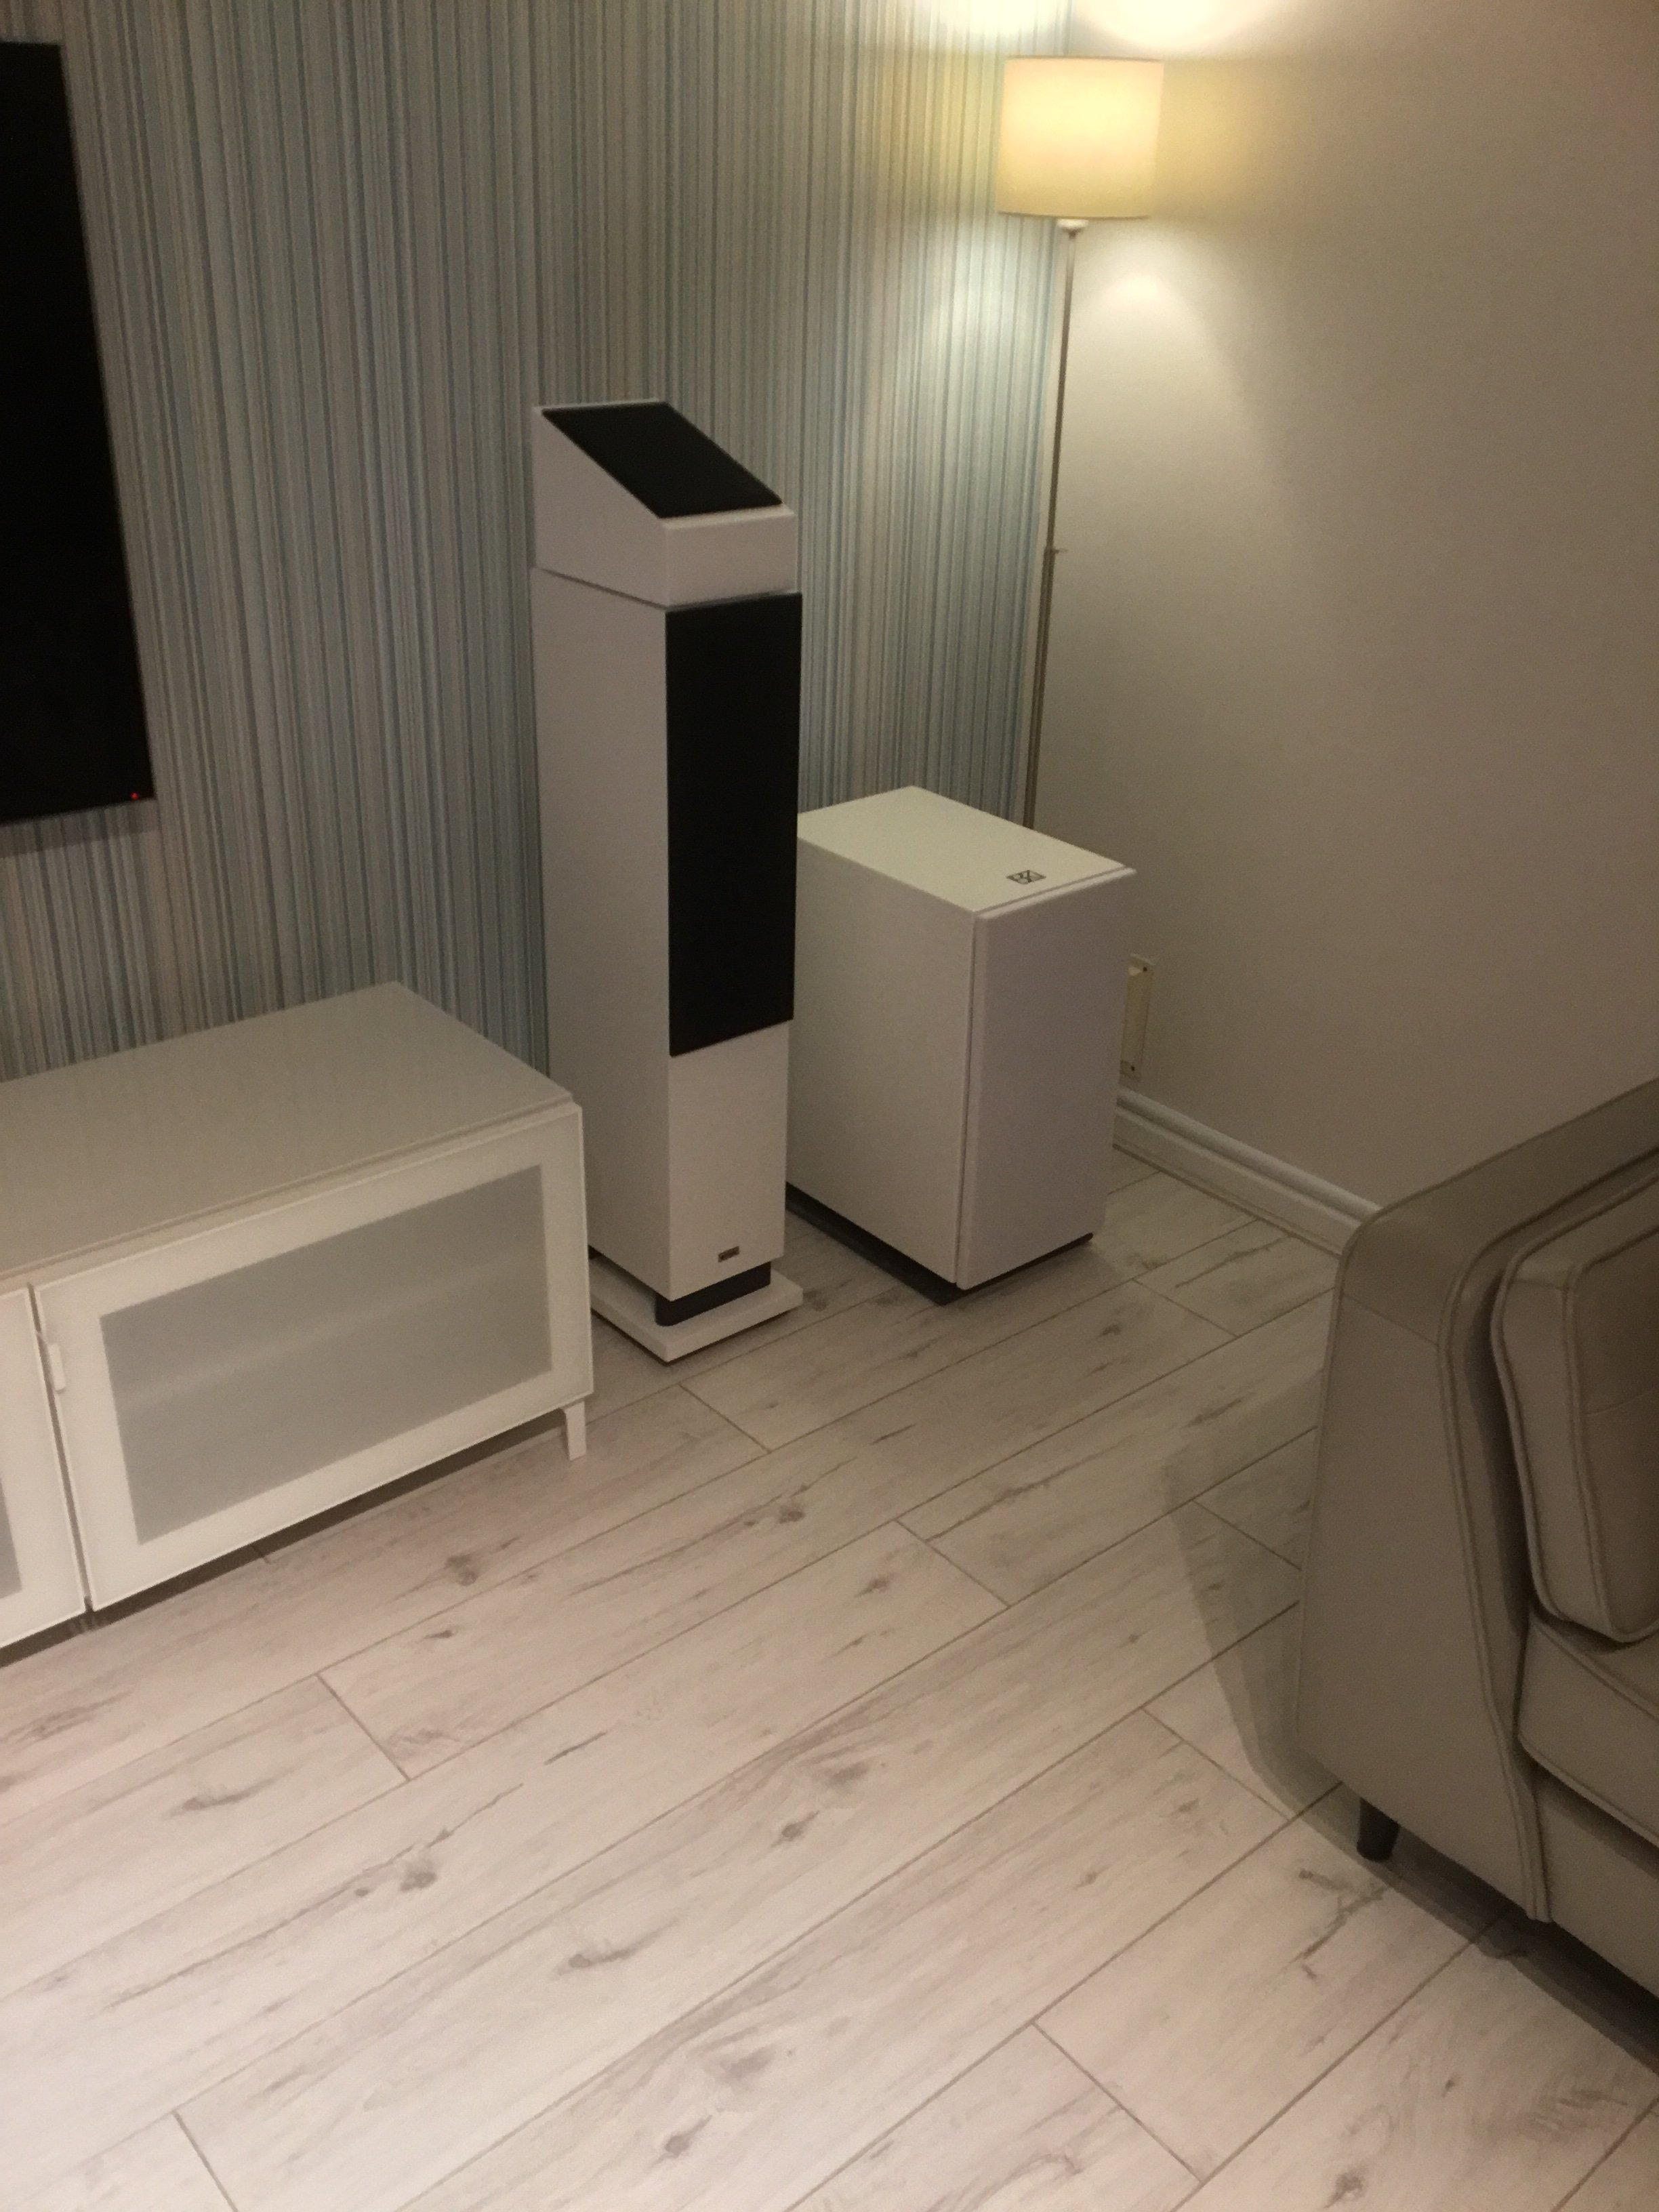 Replacing black speaker grill material for white | AVForums